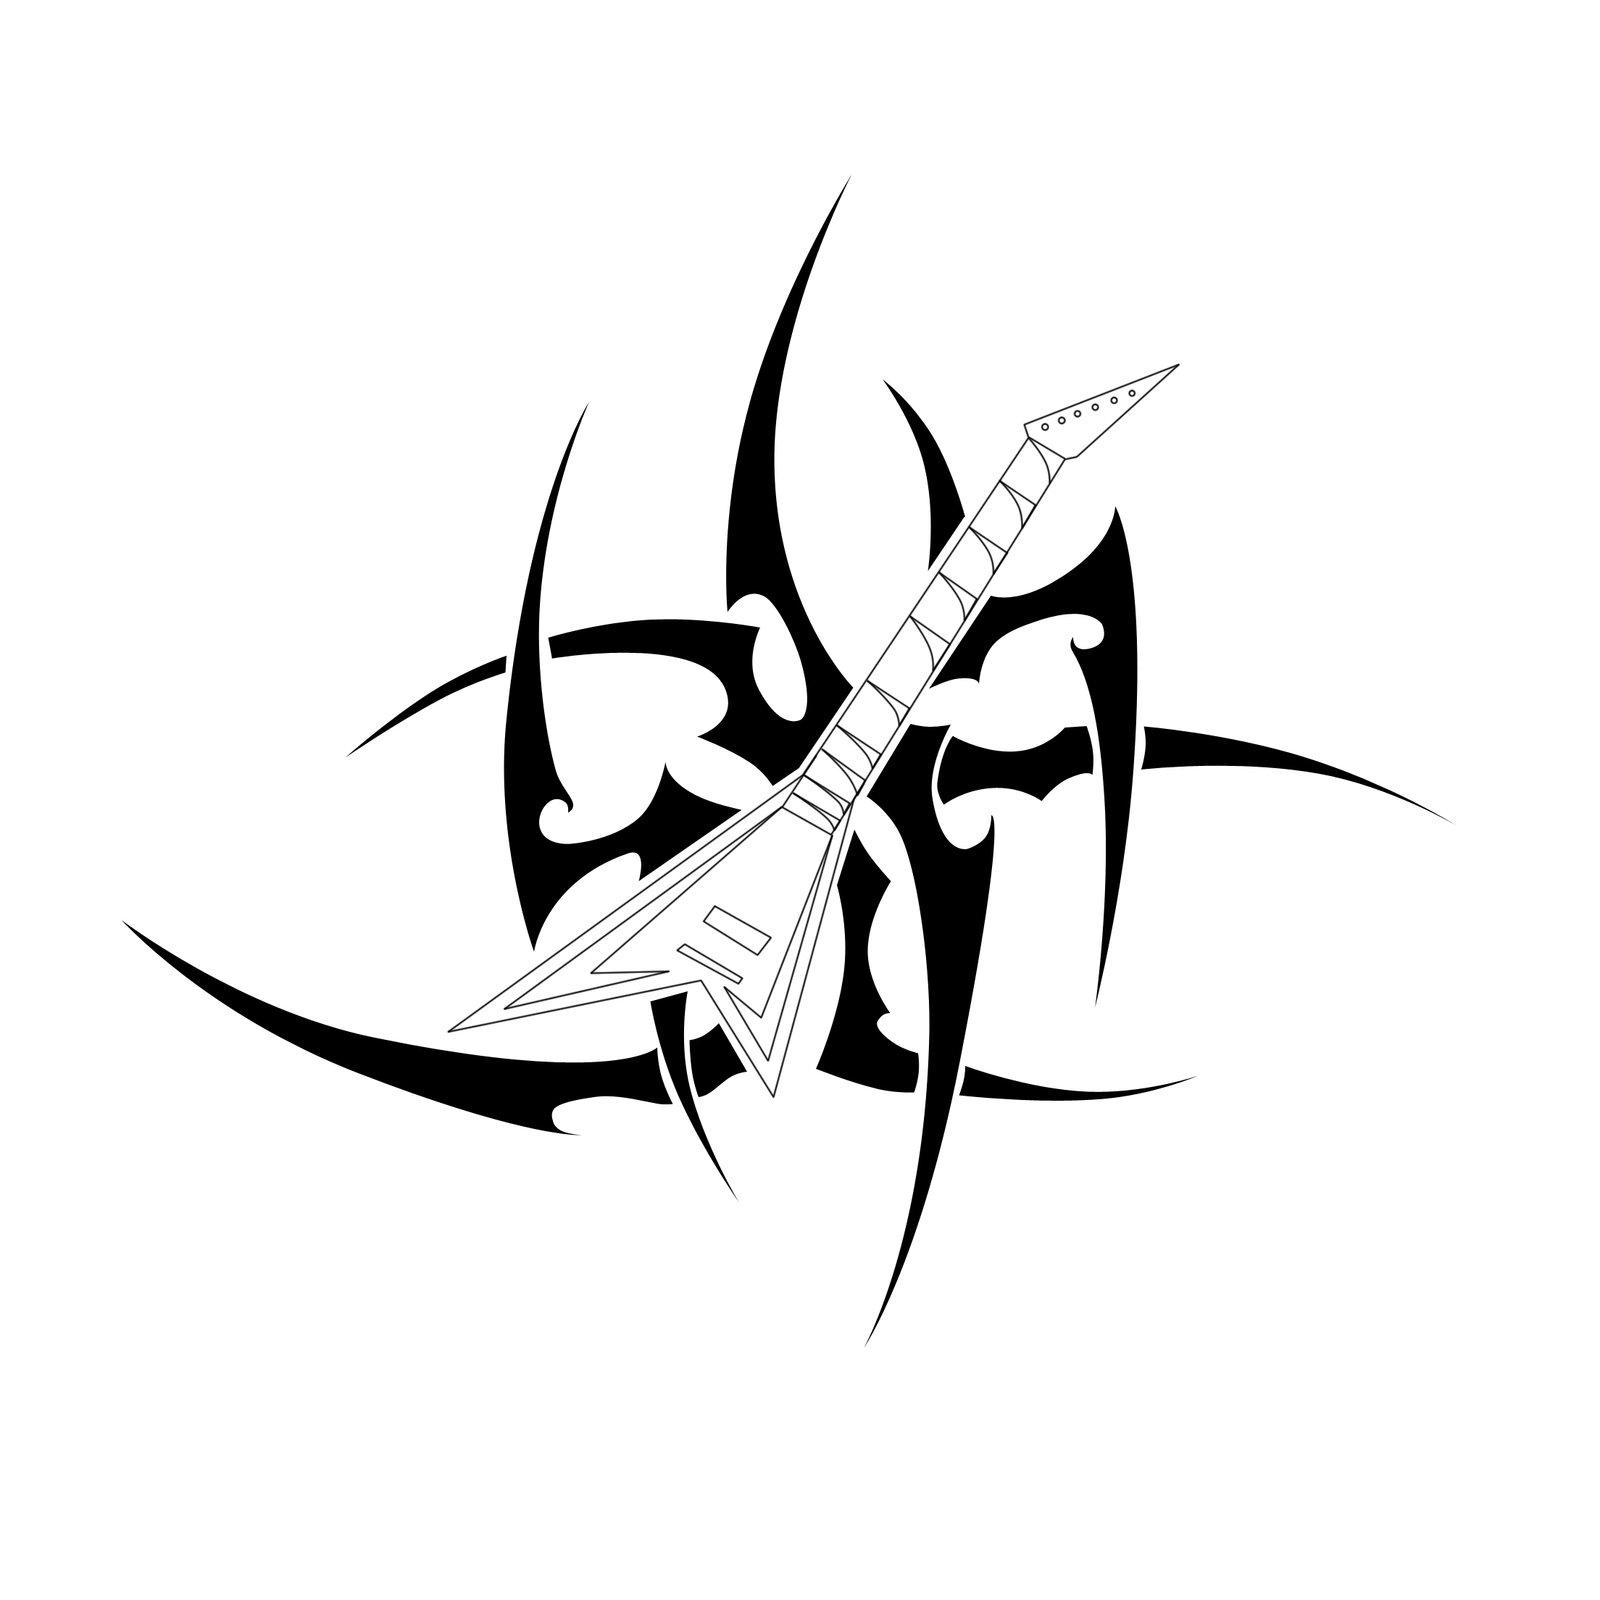 Drawn scythe tribal By by reaver55666 reaver55666 Scythe